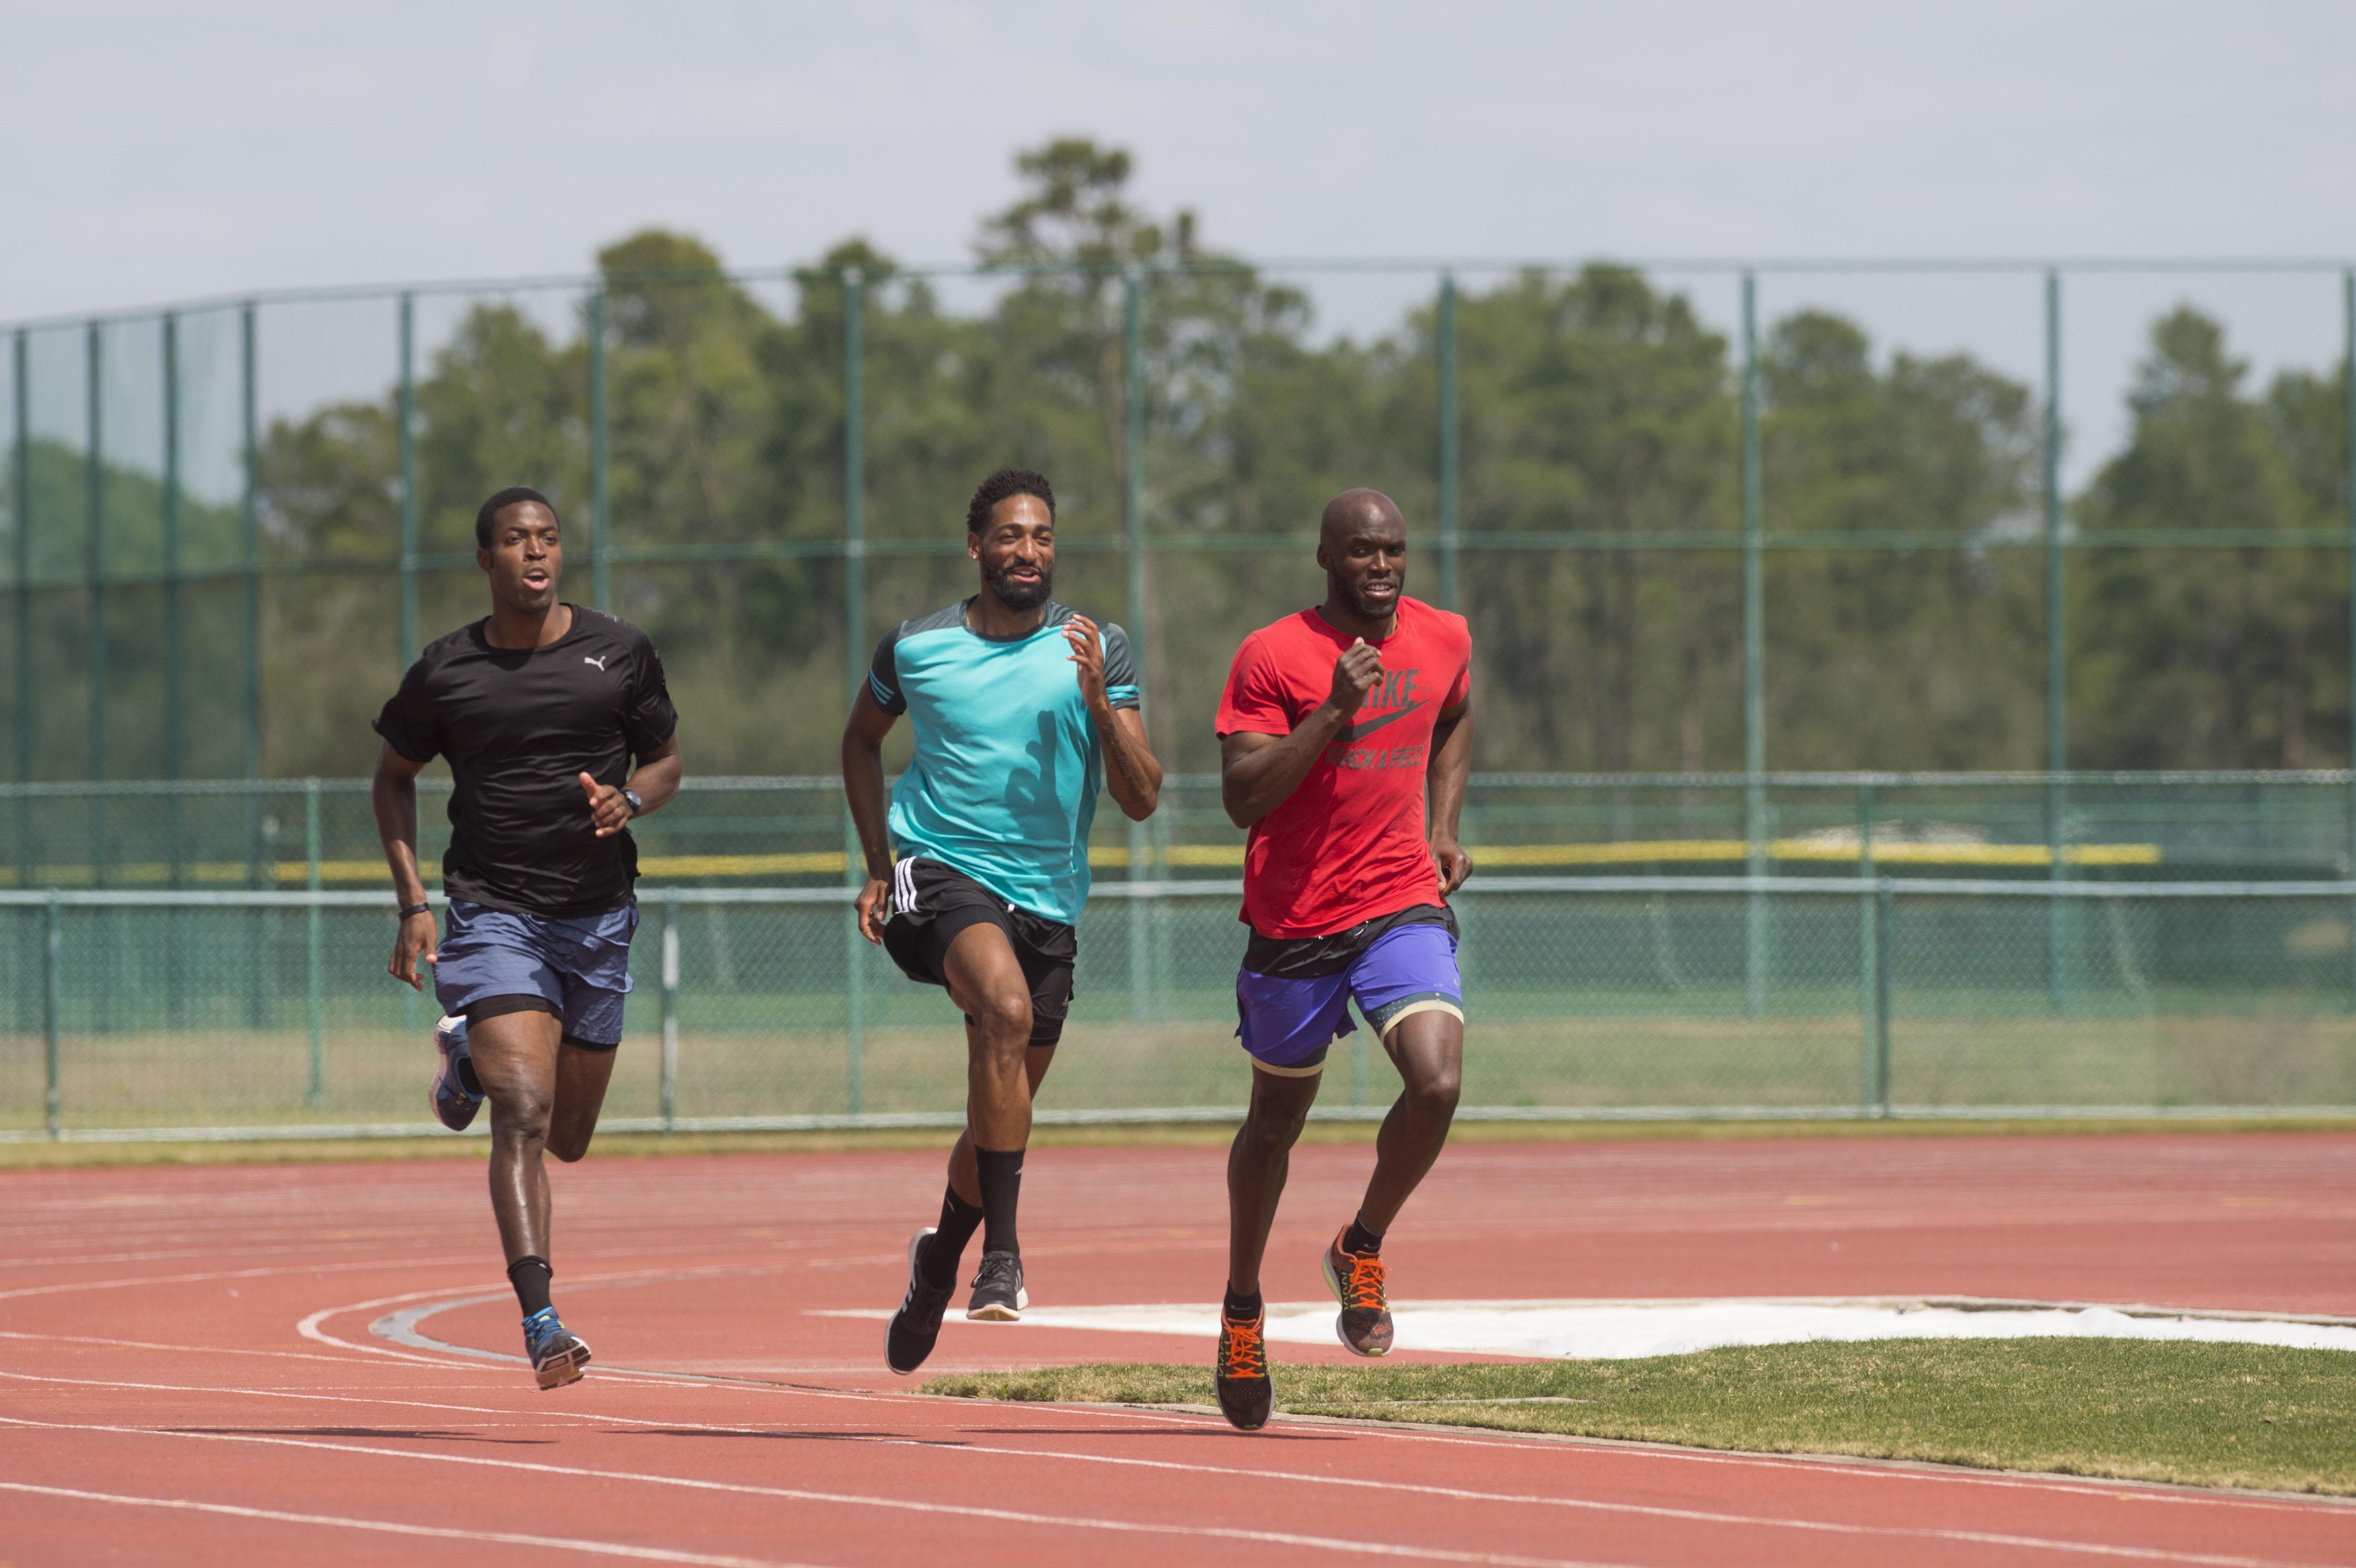 2016 Olympic Hopefuls Train at ESPN Wide World of Sports